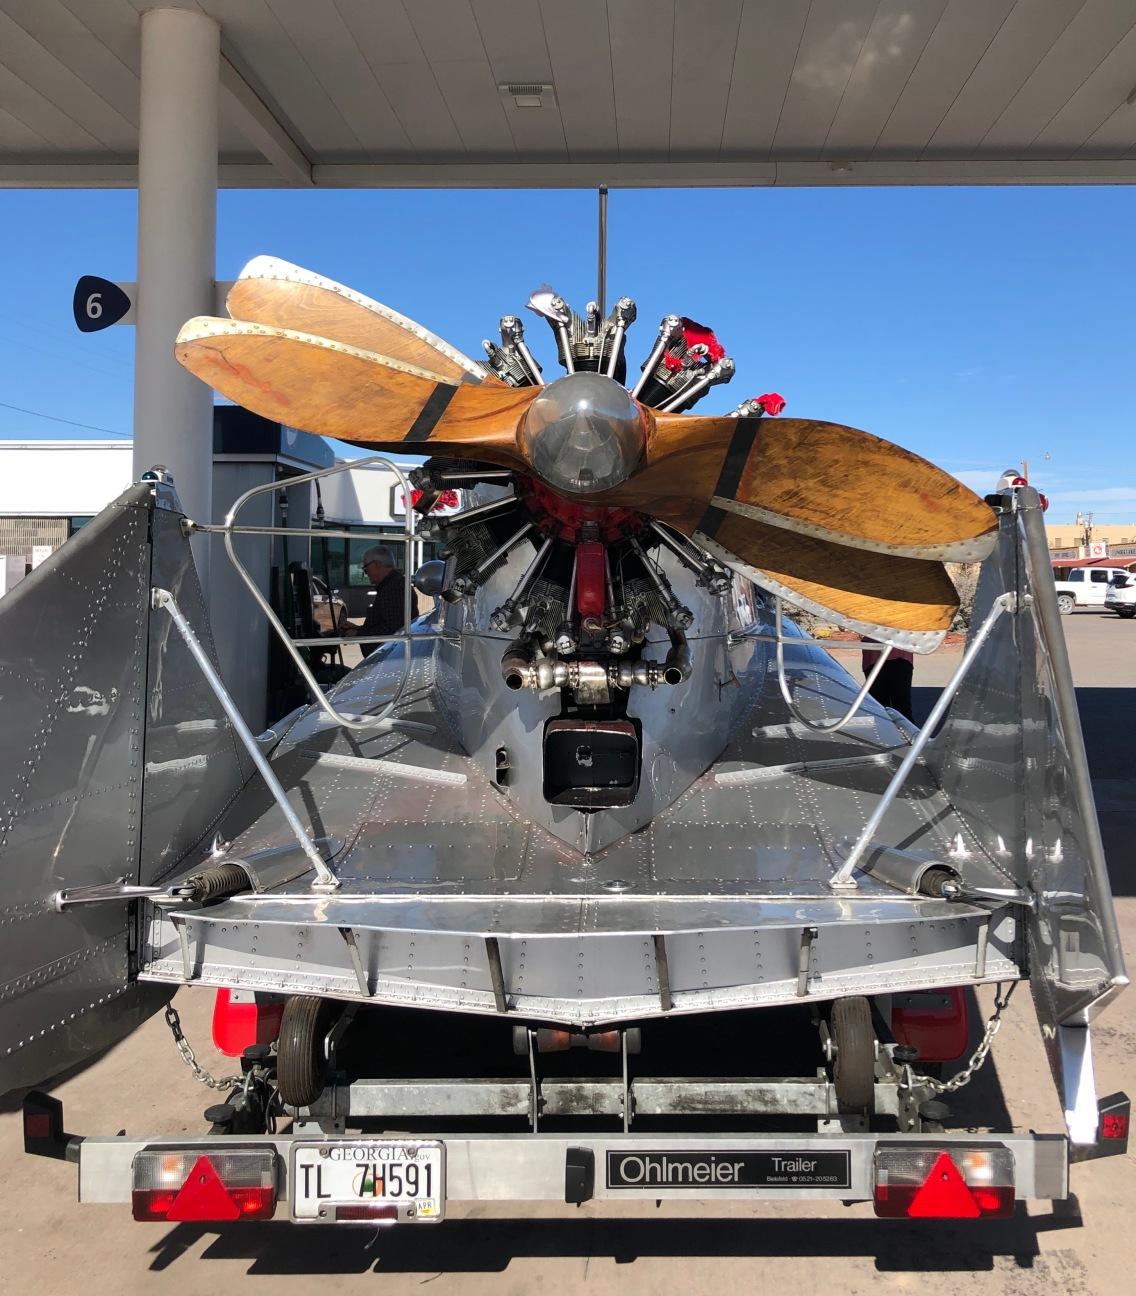 TexasValentineBoatDec2020-2